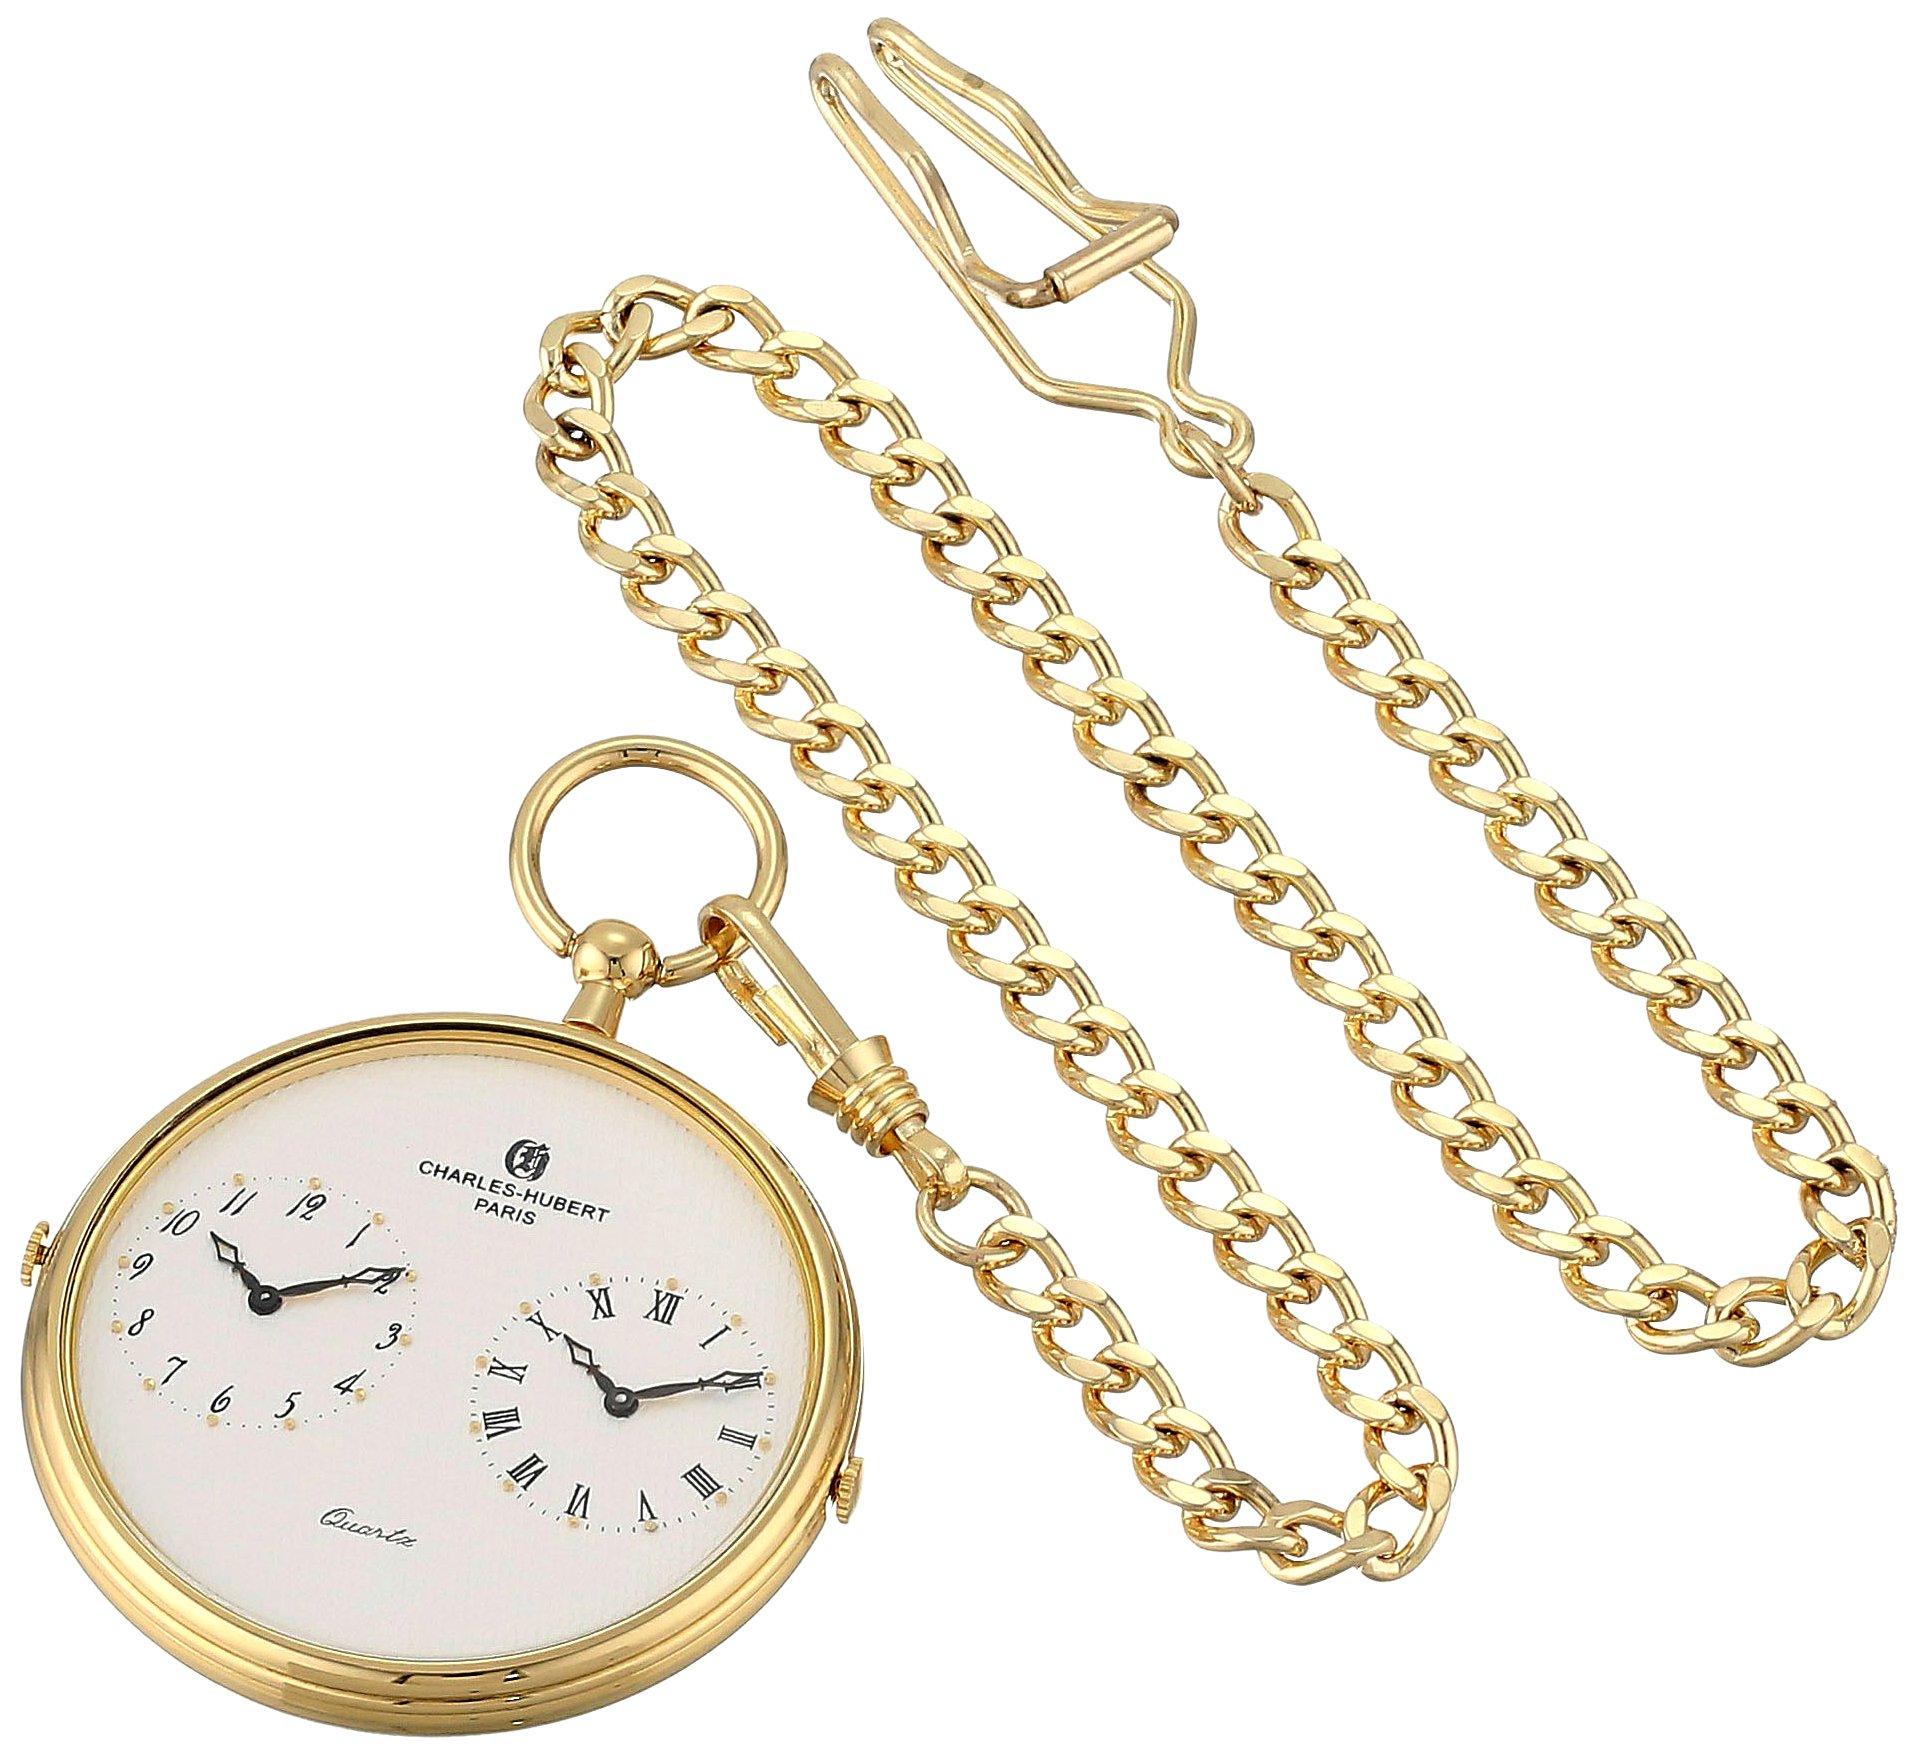 Charles-Hubert, Paris 3970-G Classic Collection Analog Display Quartz Pocket Watch by Charles-Hubert, Paris